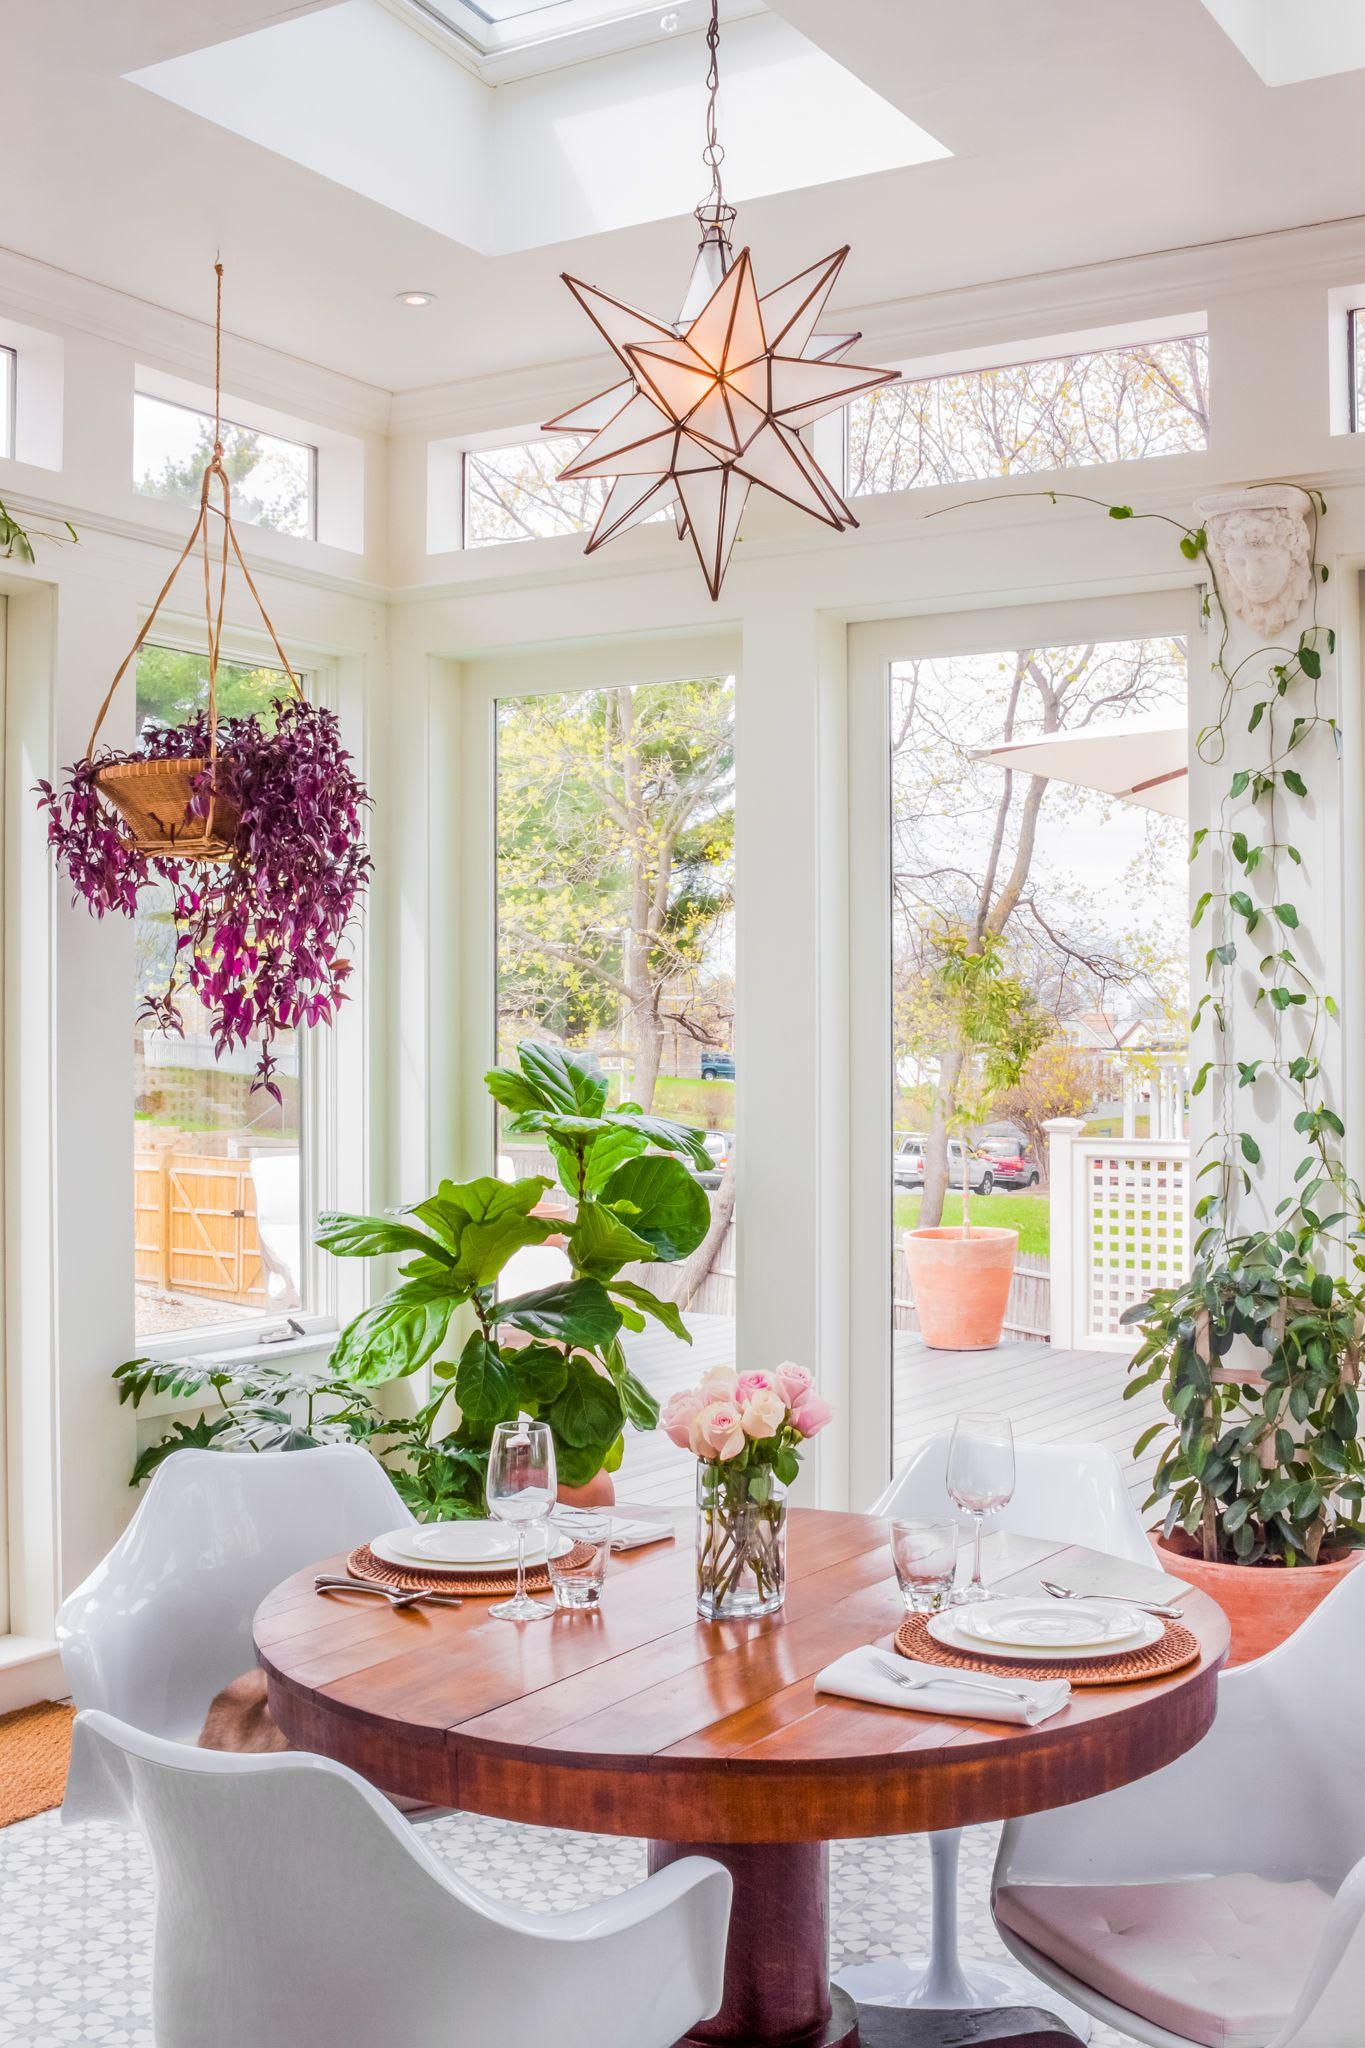 15 Bright Sunrooms That Take Every Advantage Of Natural Light: Идеи для украшения, Идеи домашнего декора и Солярий